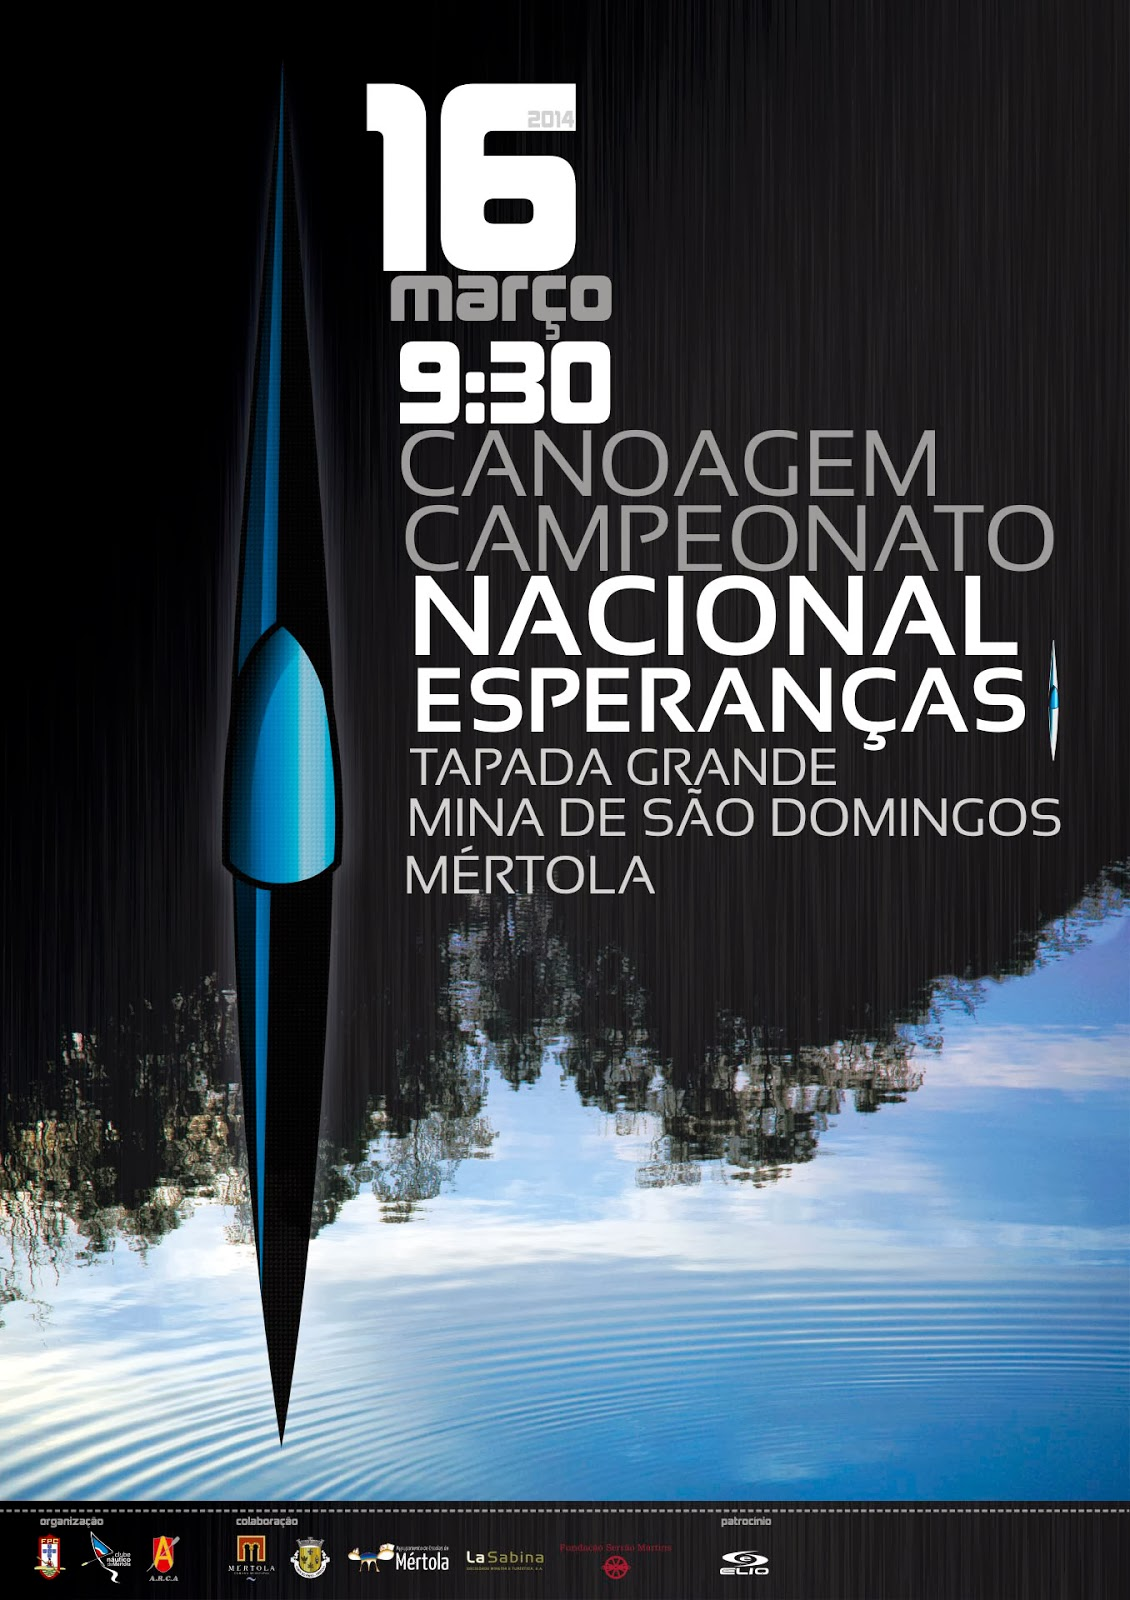 http://cnemertola.blogspot.pt/